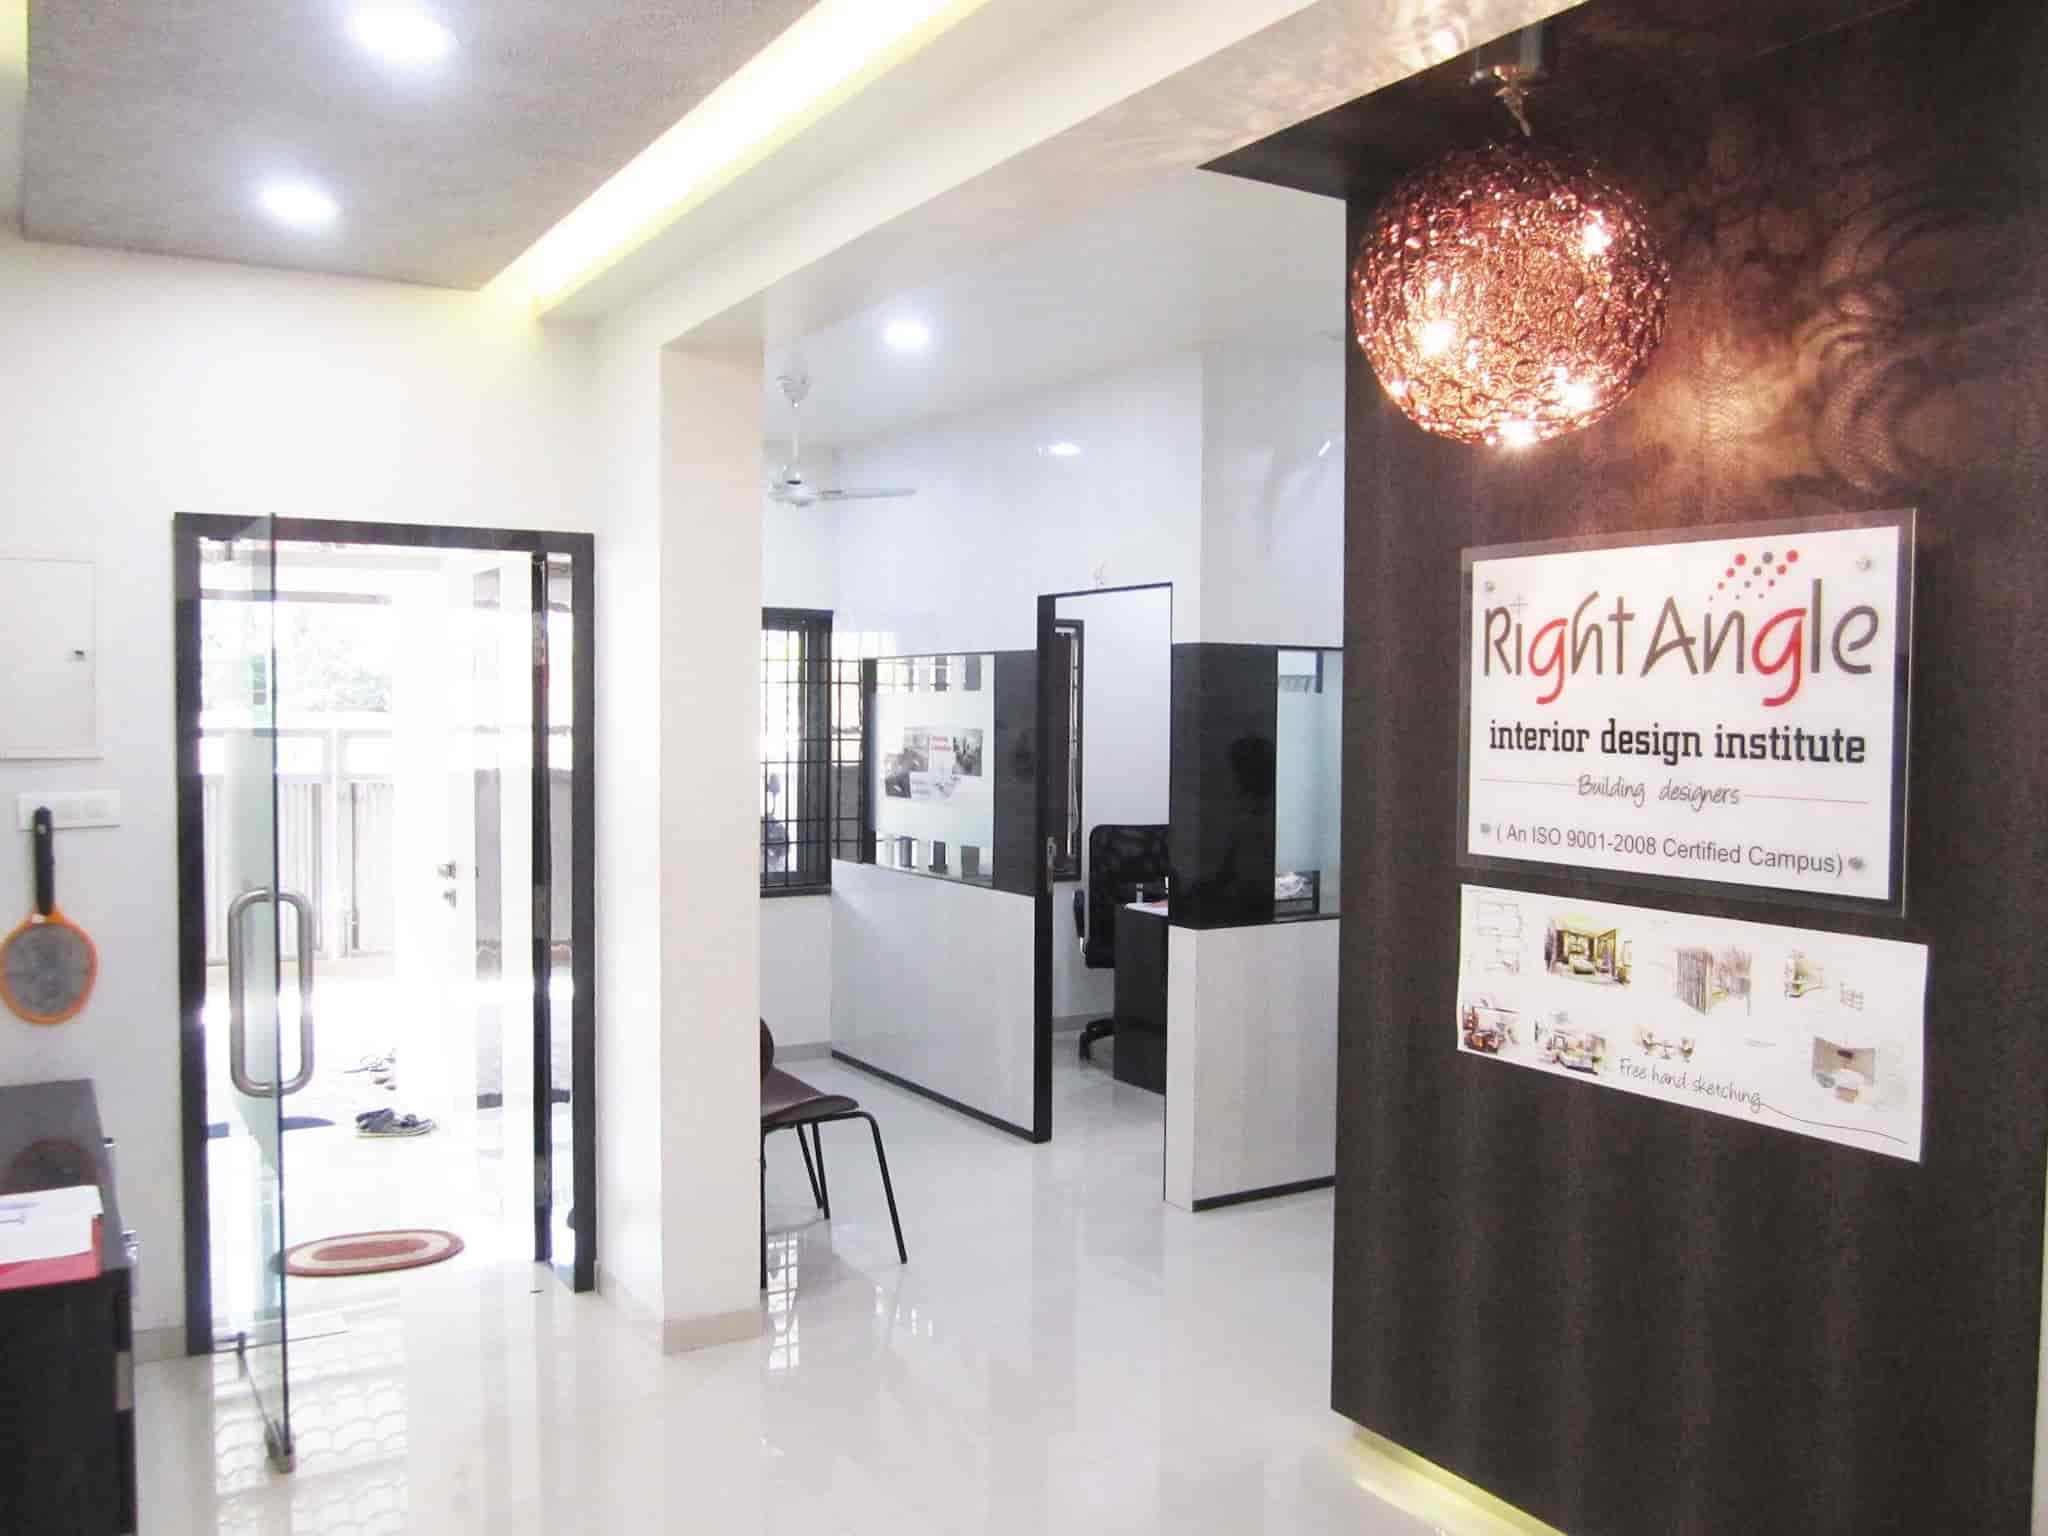 Right angle interior design institute kilpauk animation training institutes in chennai justdial